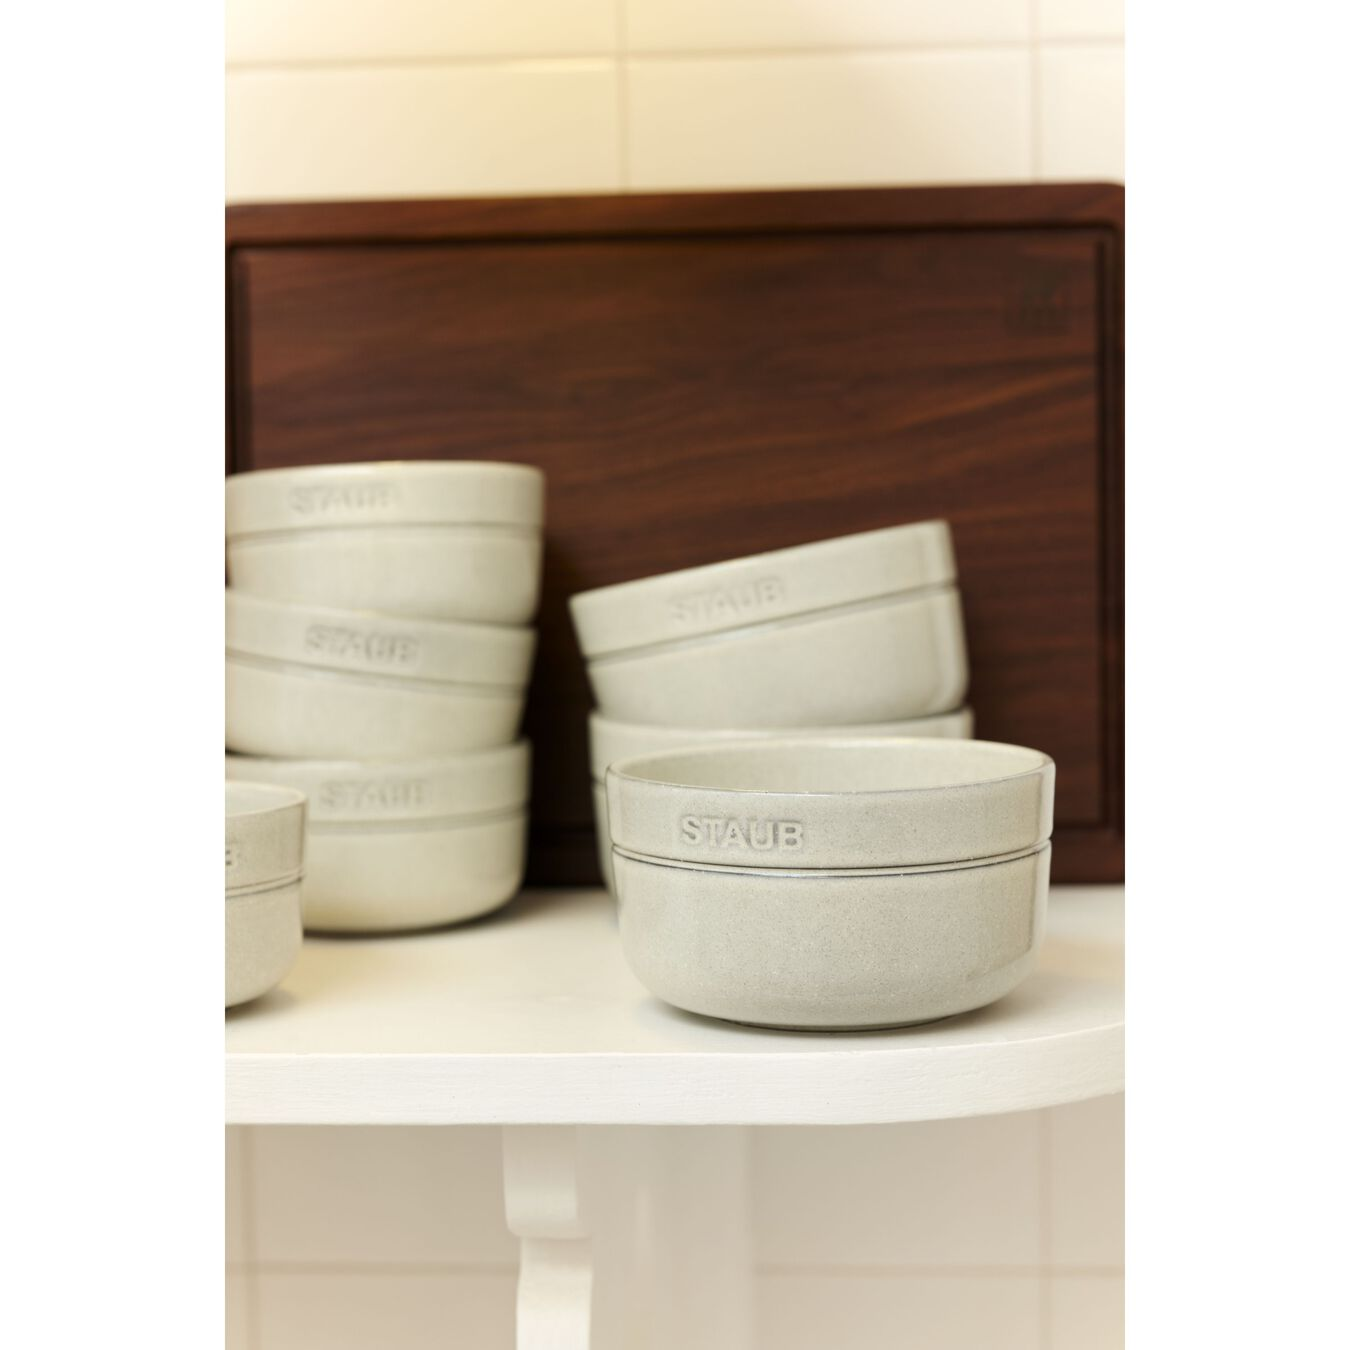 Ciotola rotonda - 12 cm, tartufo bianco,,large 3